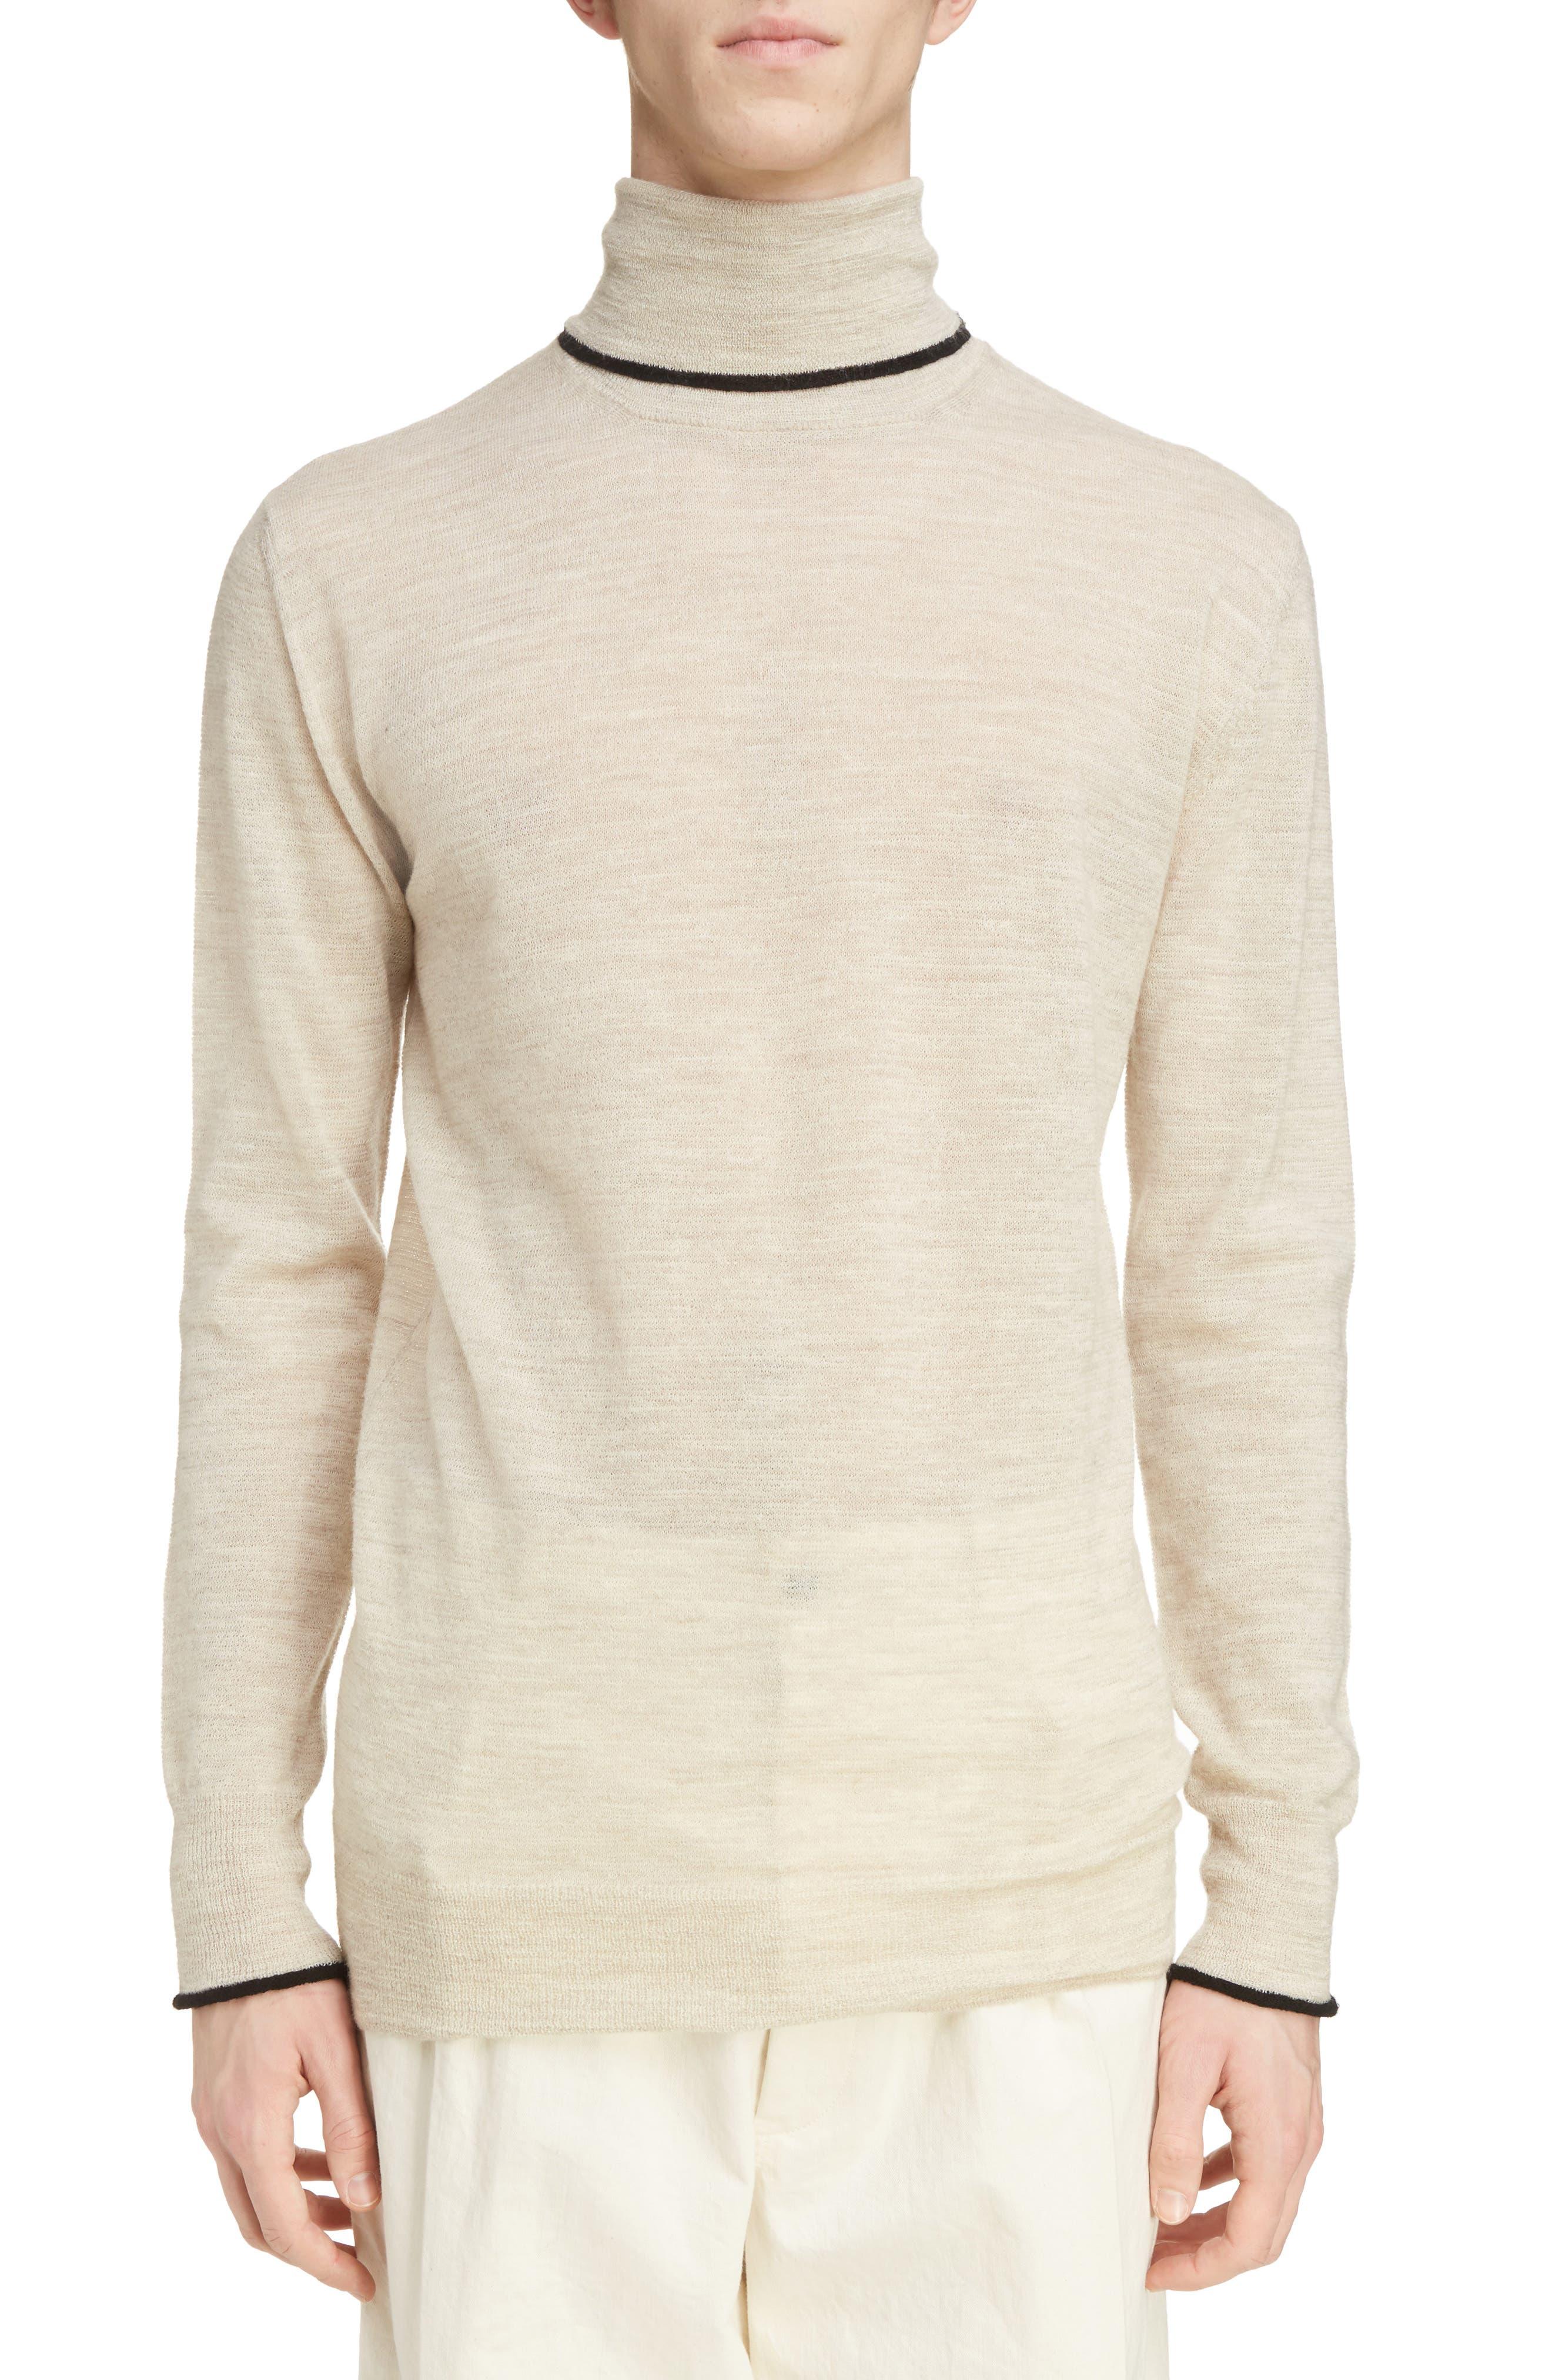 Alternate Image 1 Selected - Lanvin Contrast Tipped Wool Turtleneck